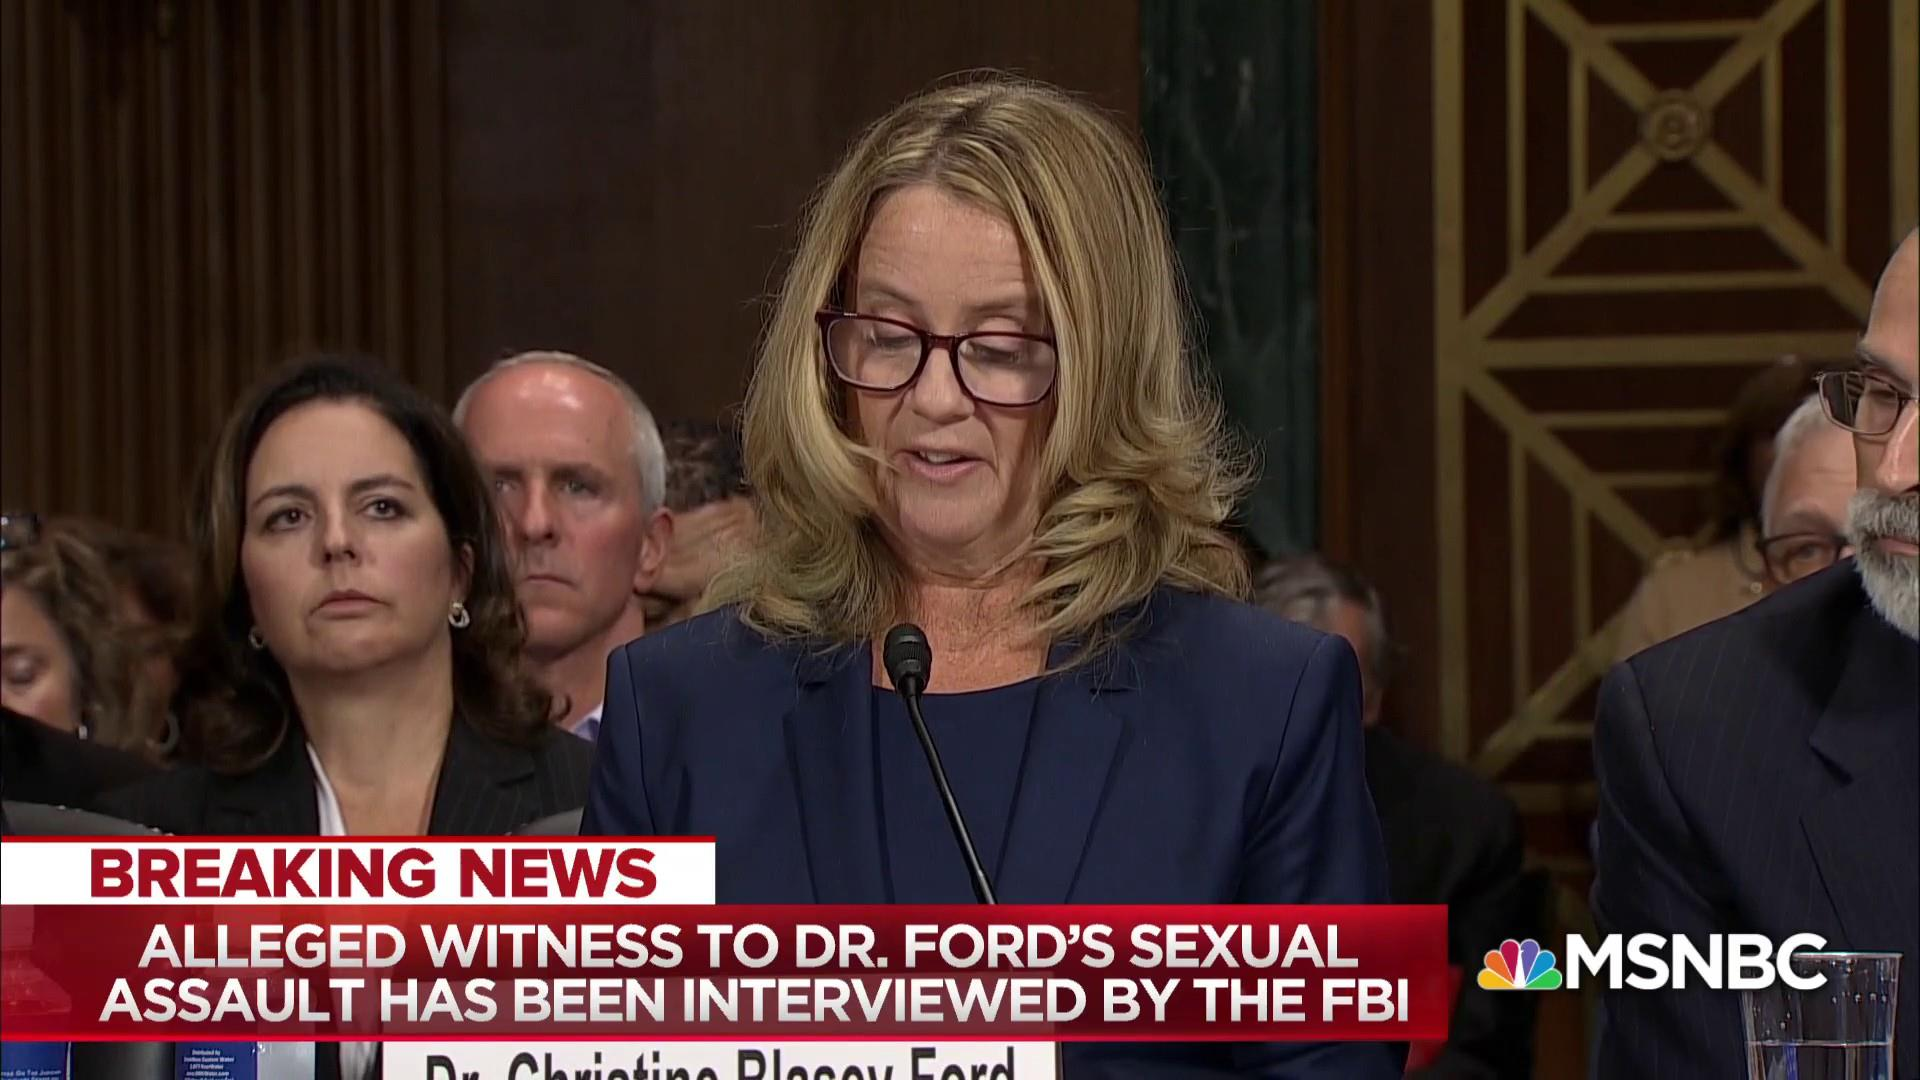 Key witness in Kavanaugh allegation interviewed by FBI